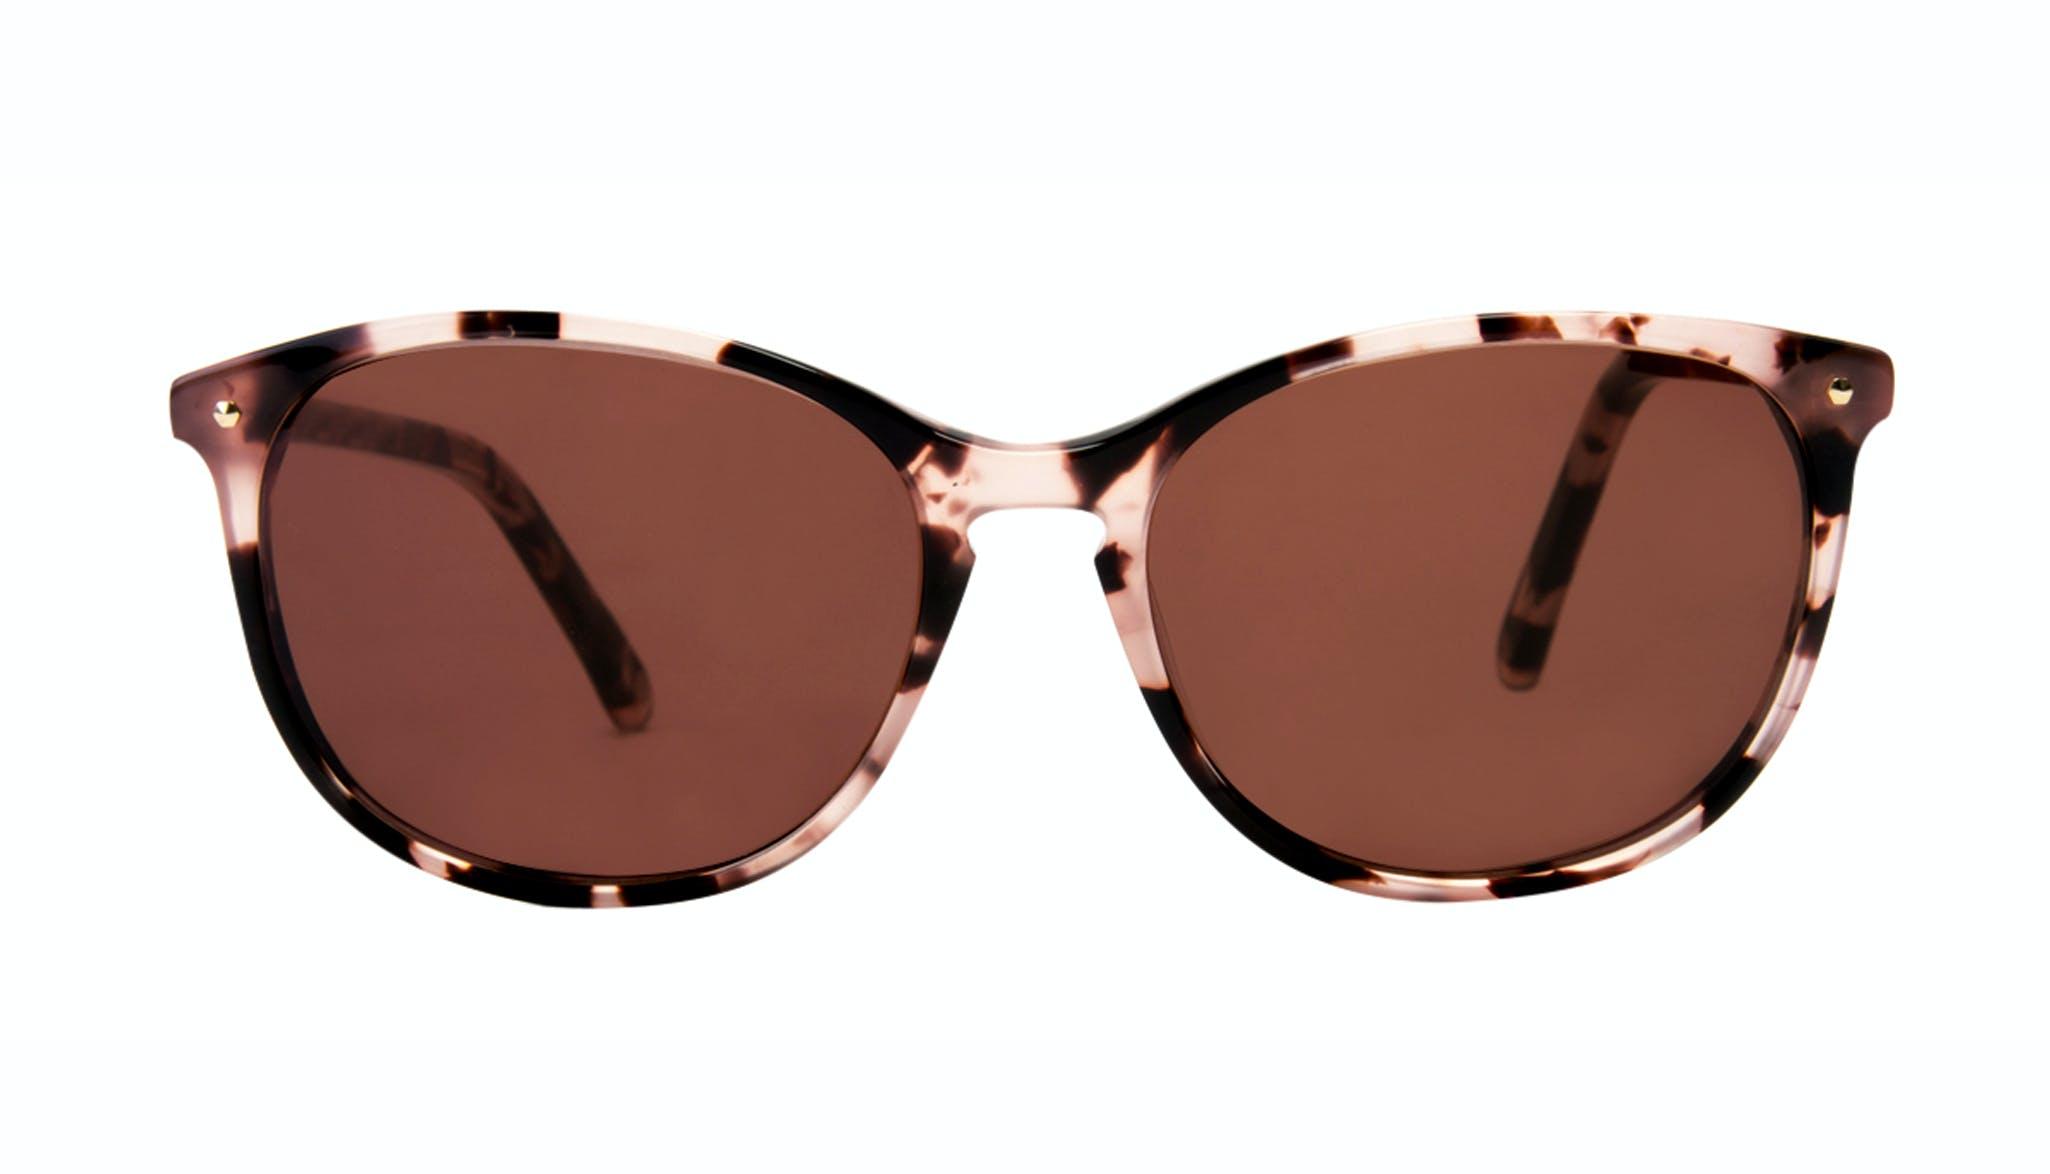 Affordable Fashion Glasses Rectangle Square Round Sunglasses Women Nadine Pink Tortoise Front